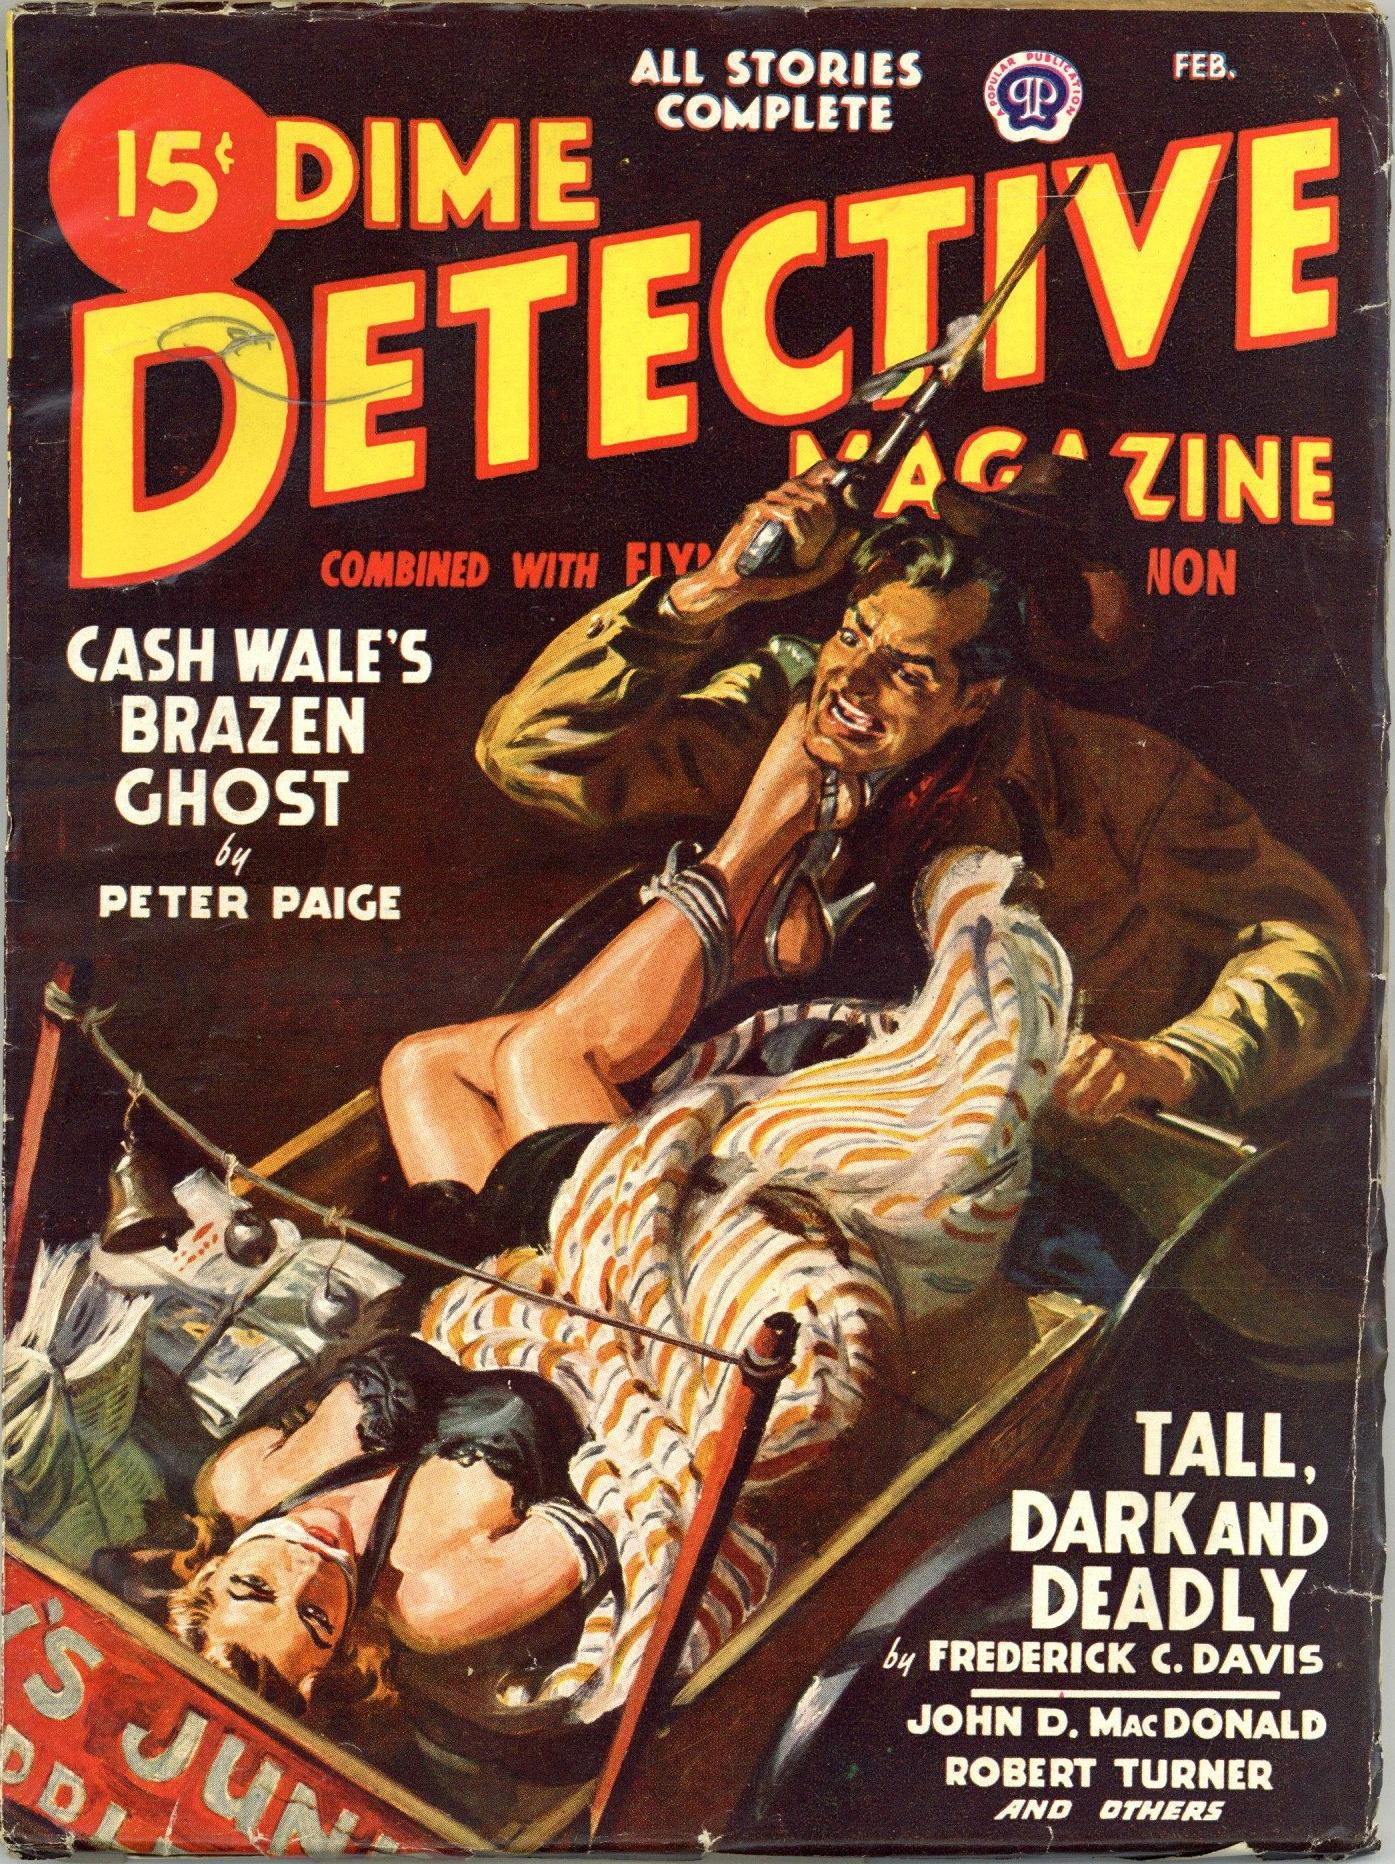 Dime Detective February 1948